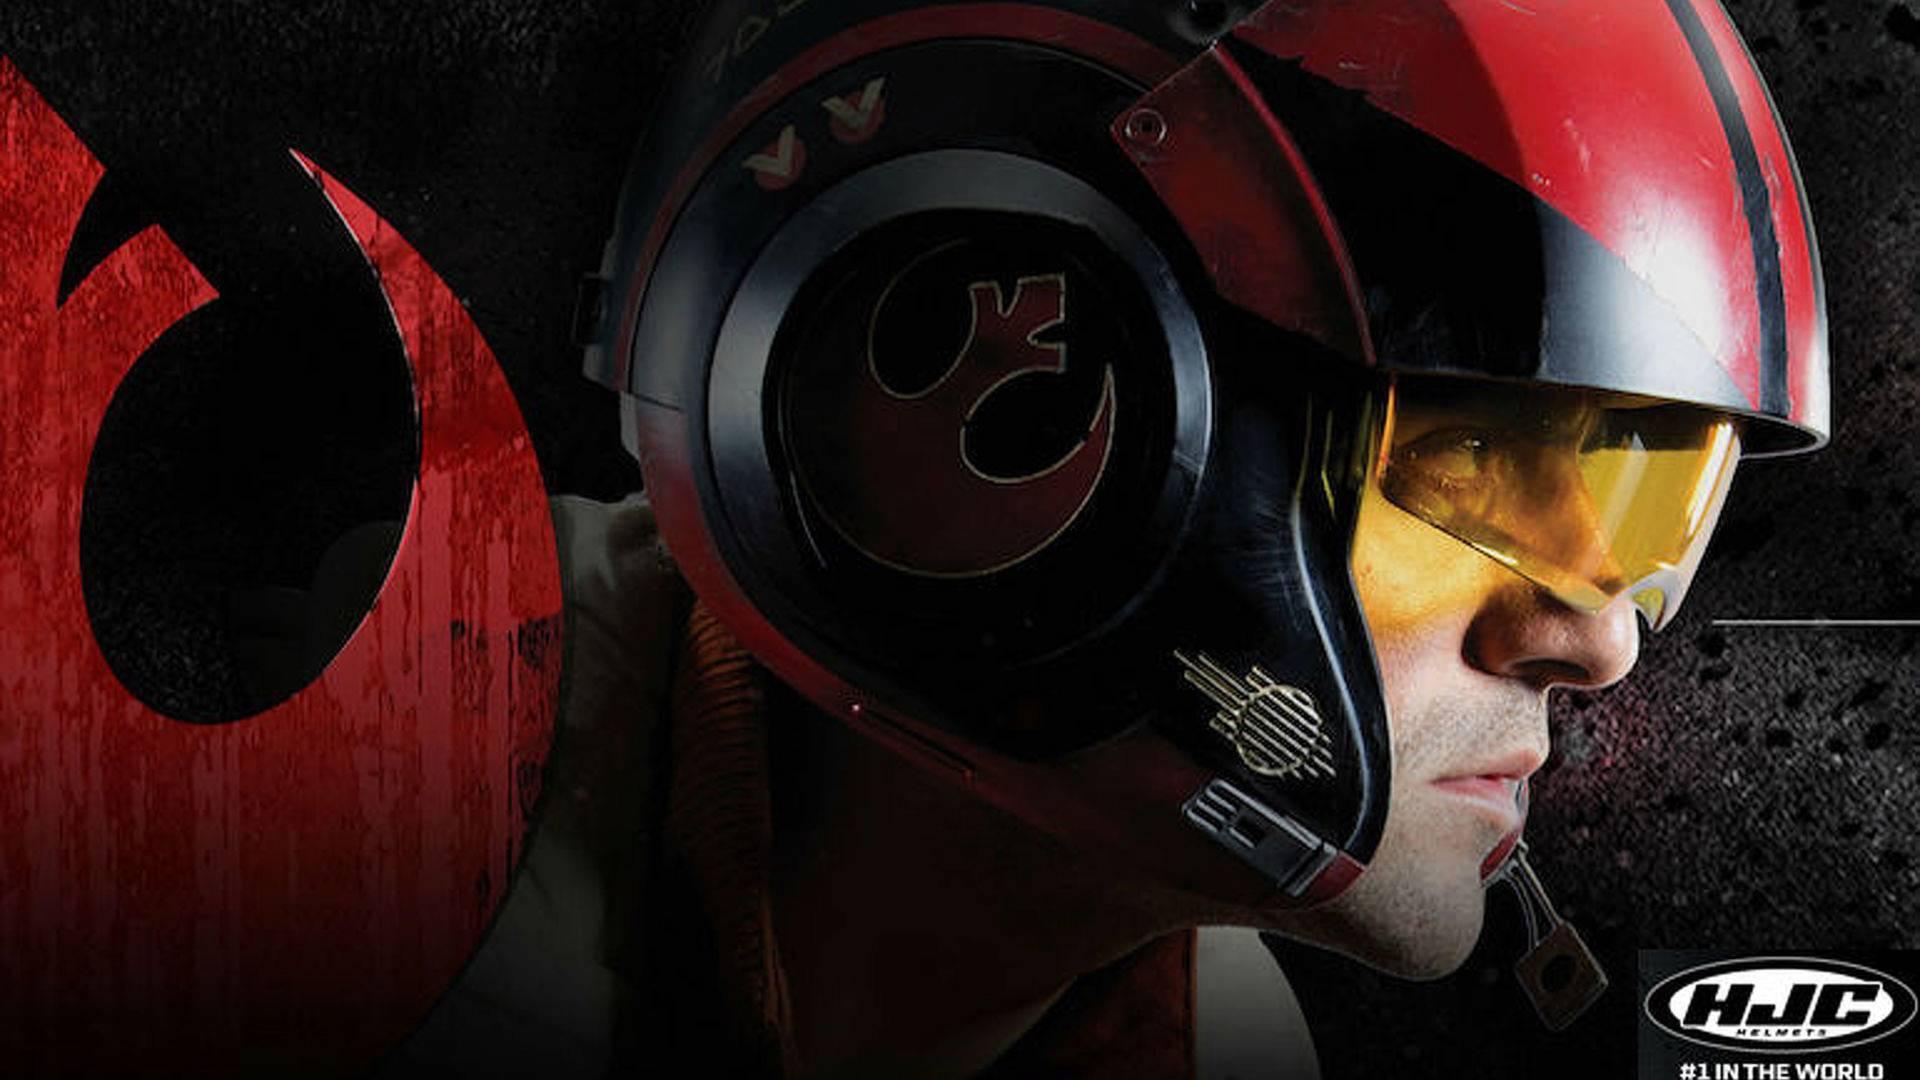 HJC Unveils 'Poe Dameron' Star Wars Helmet